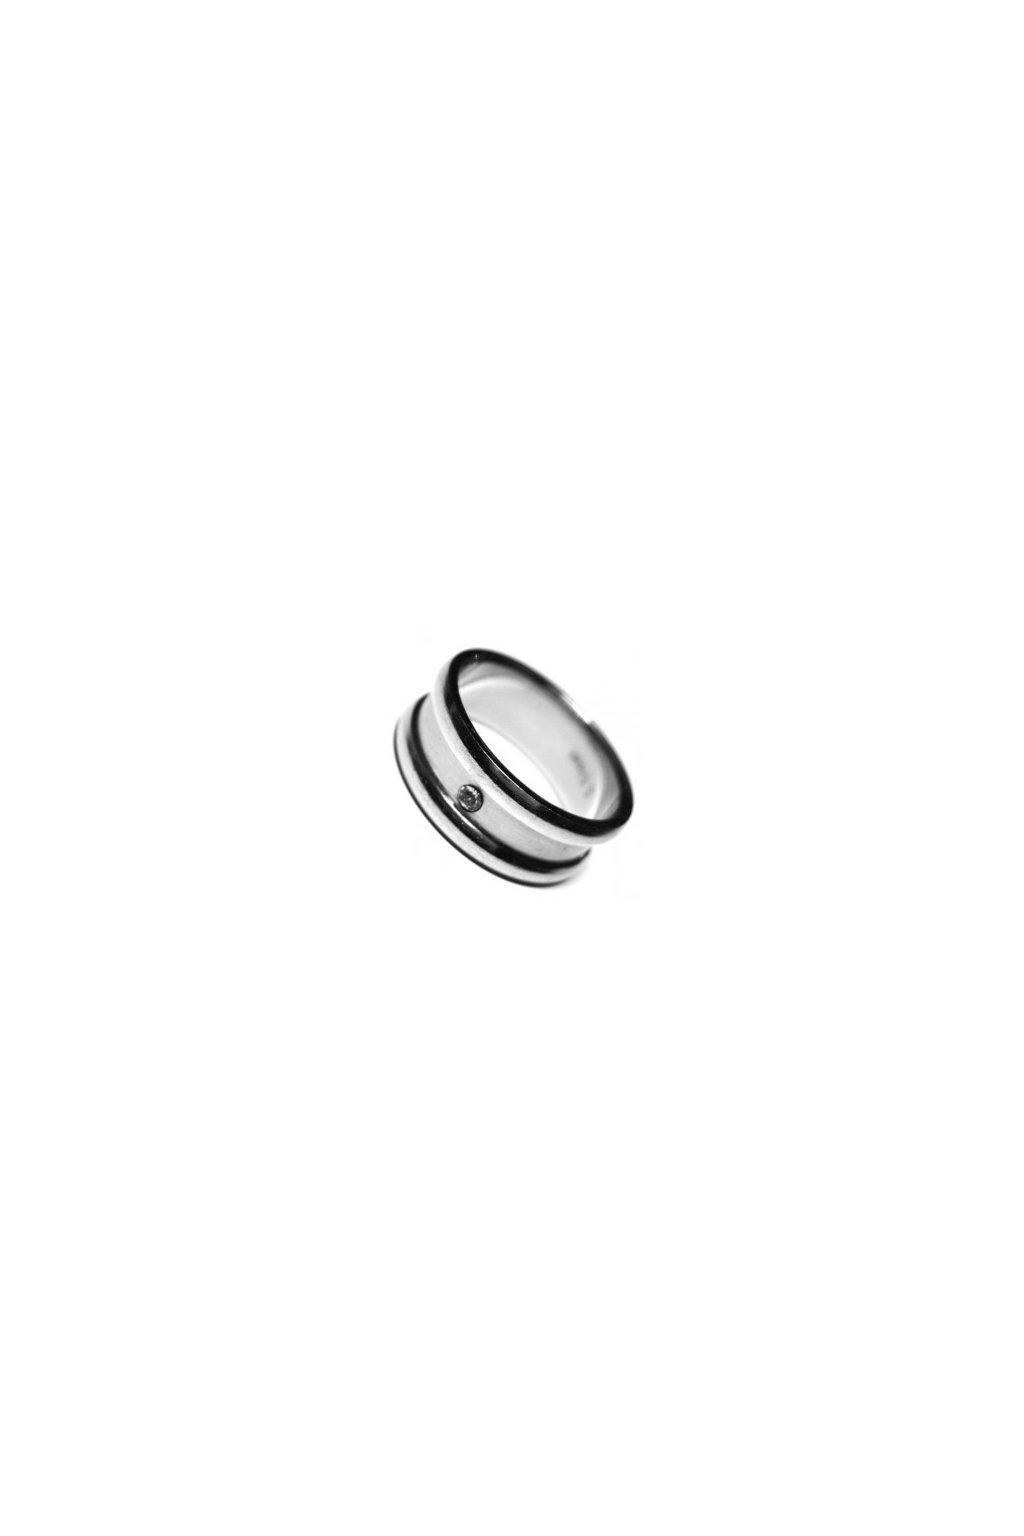 Skalimar Prsten z chirurgické oceli S PROUŽKY A ZIRKONEM 212059